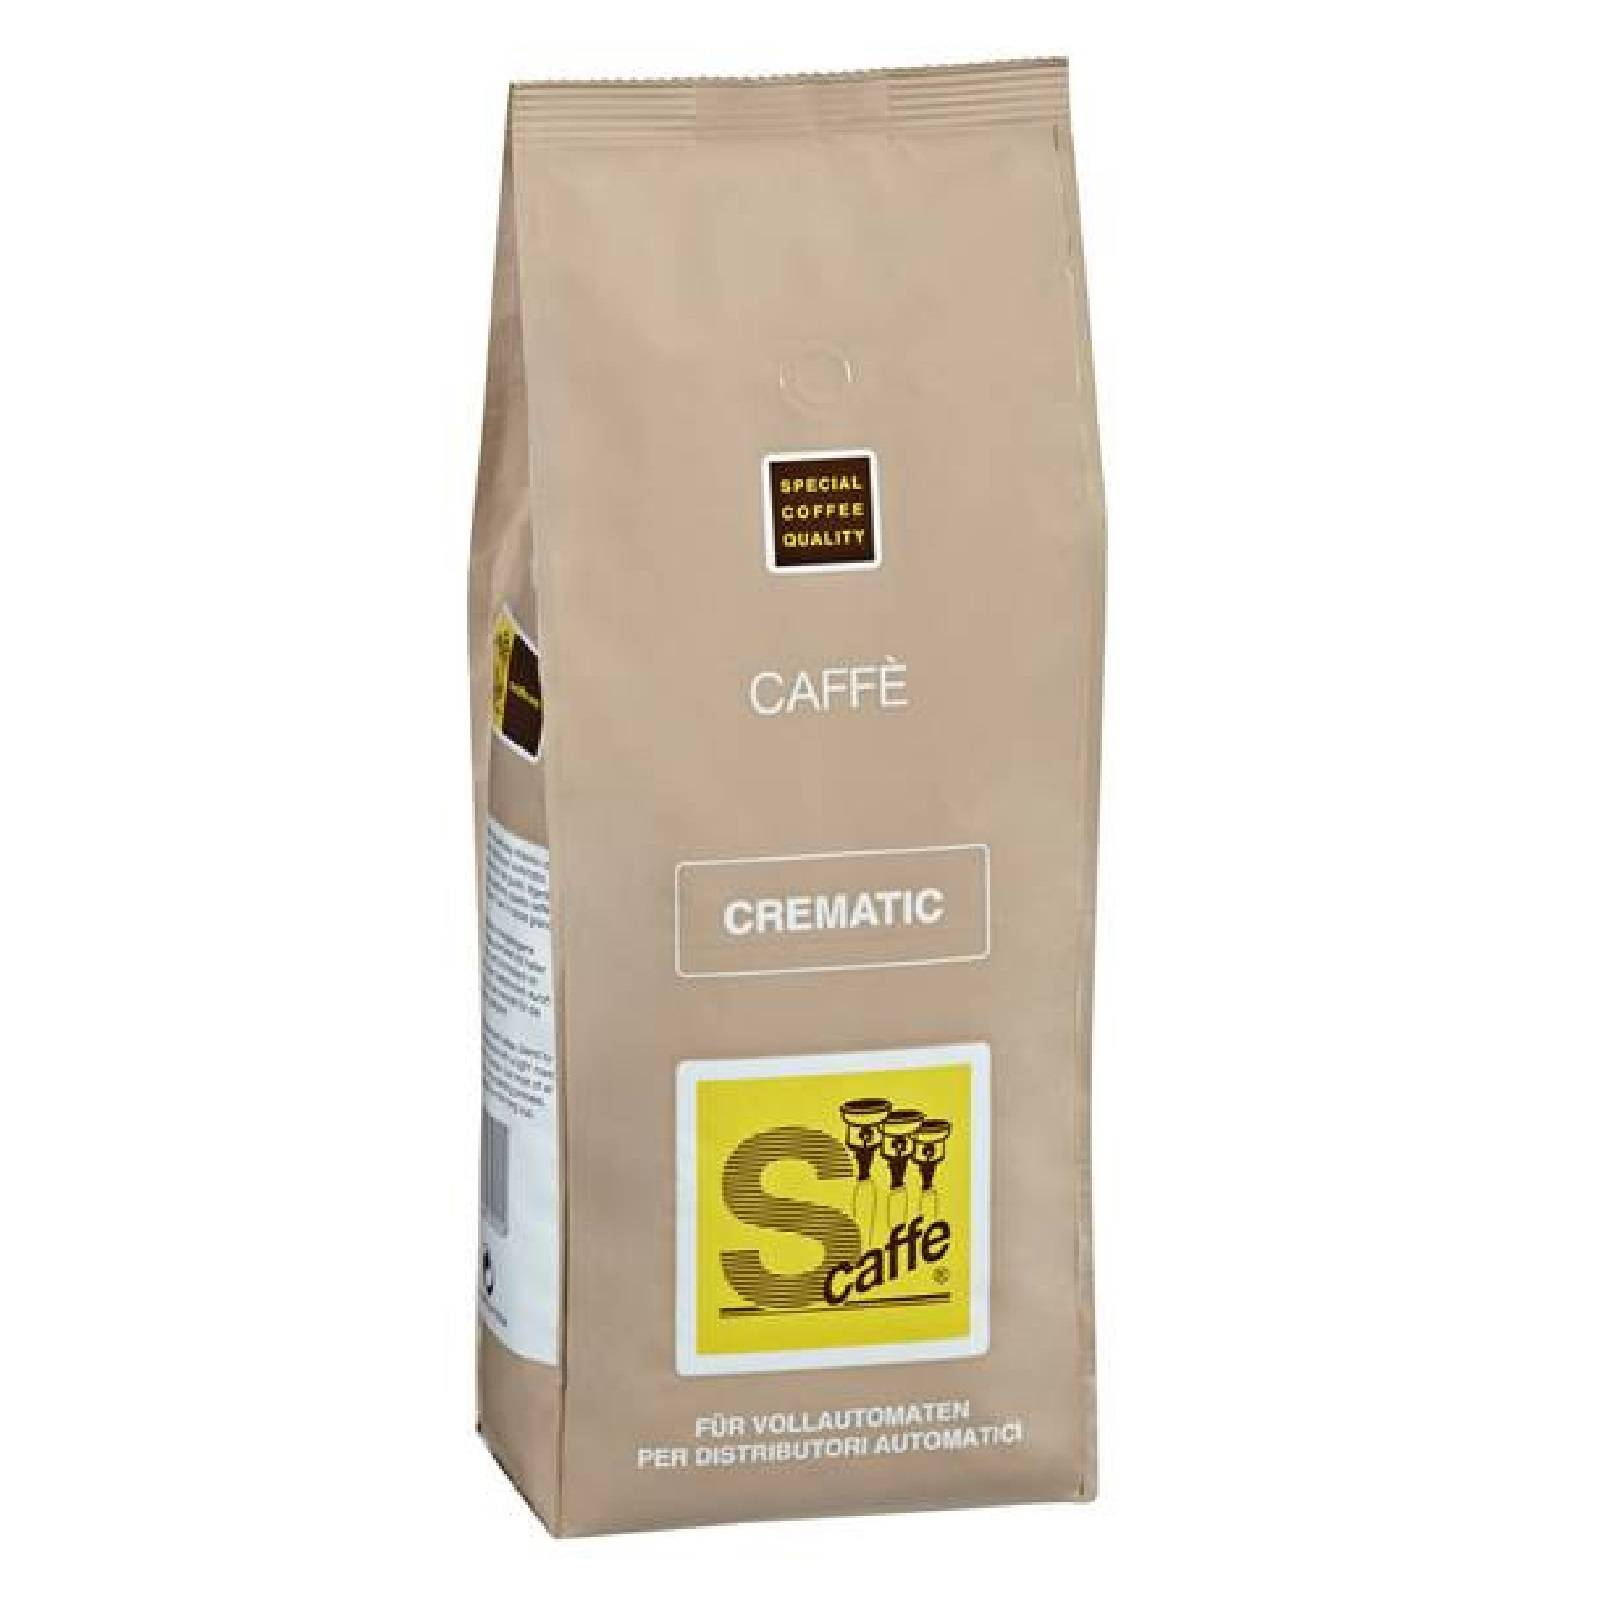 Café Crème Crematic 1000g Kaffee ganze Bohnen